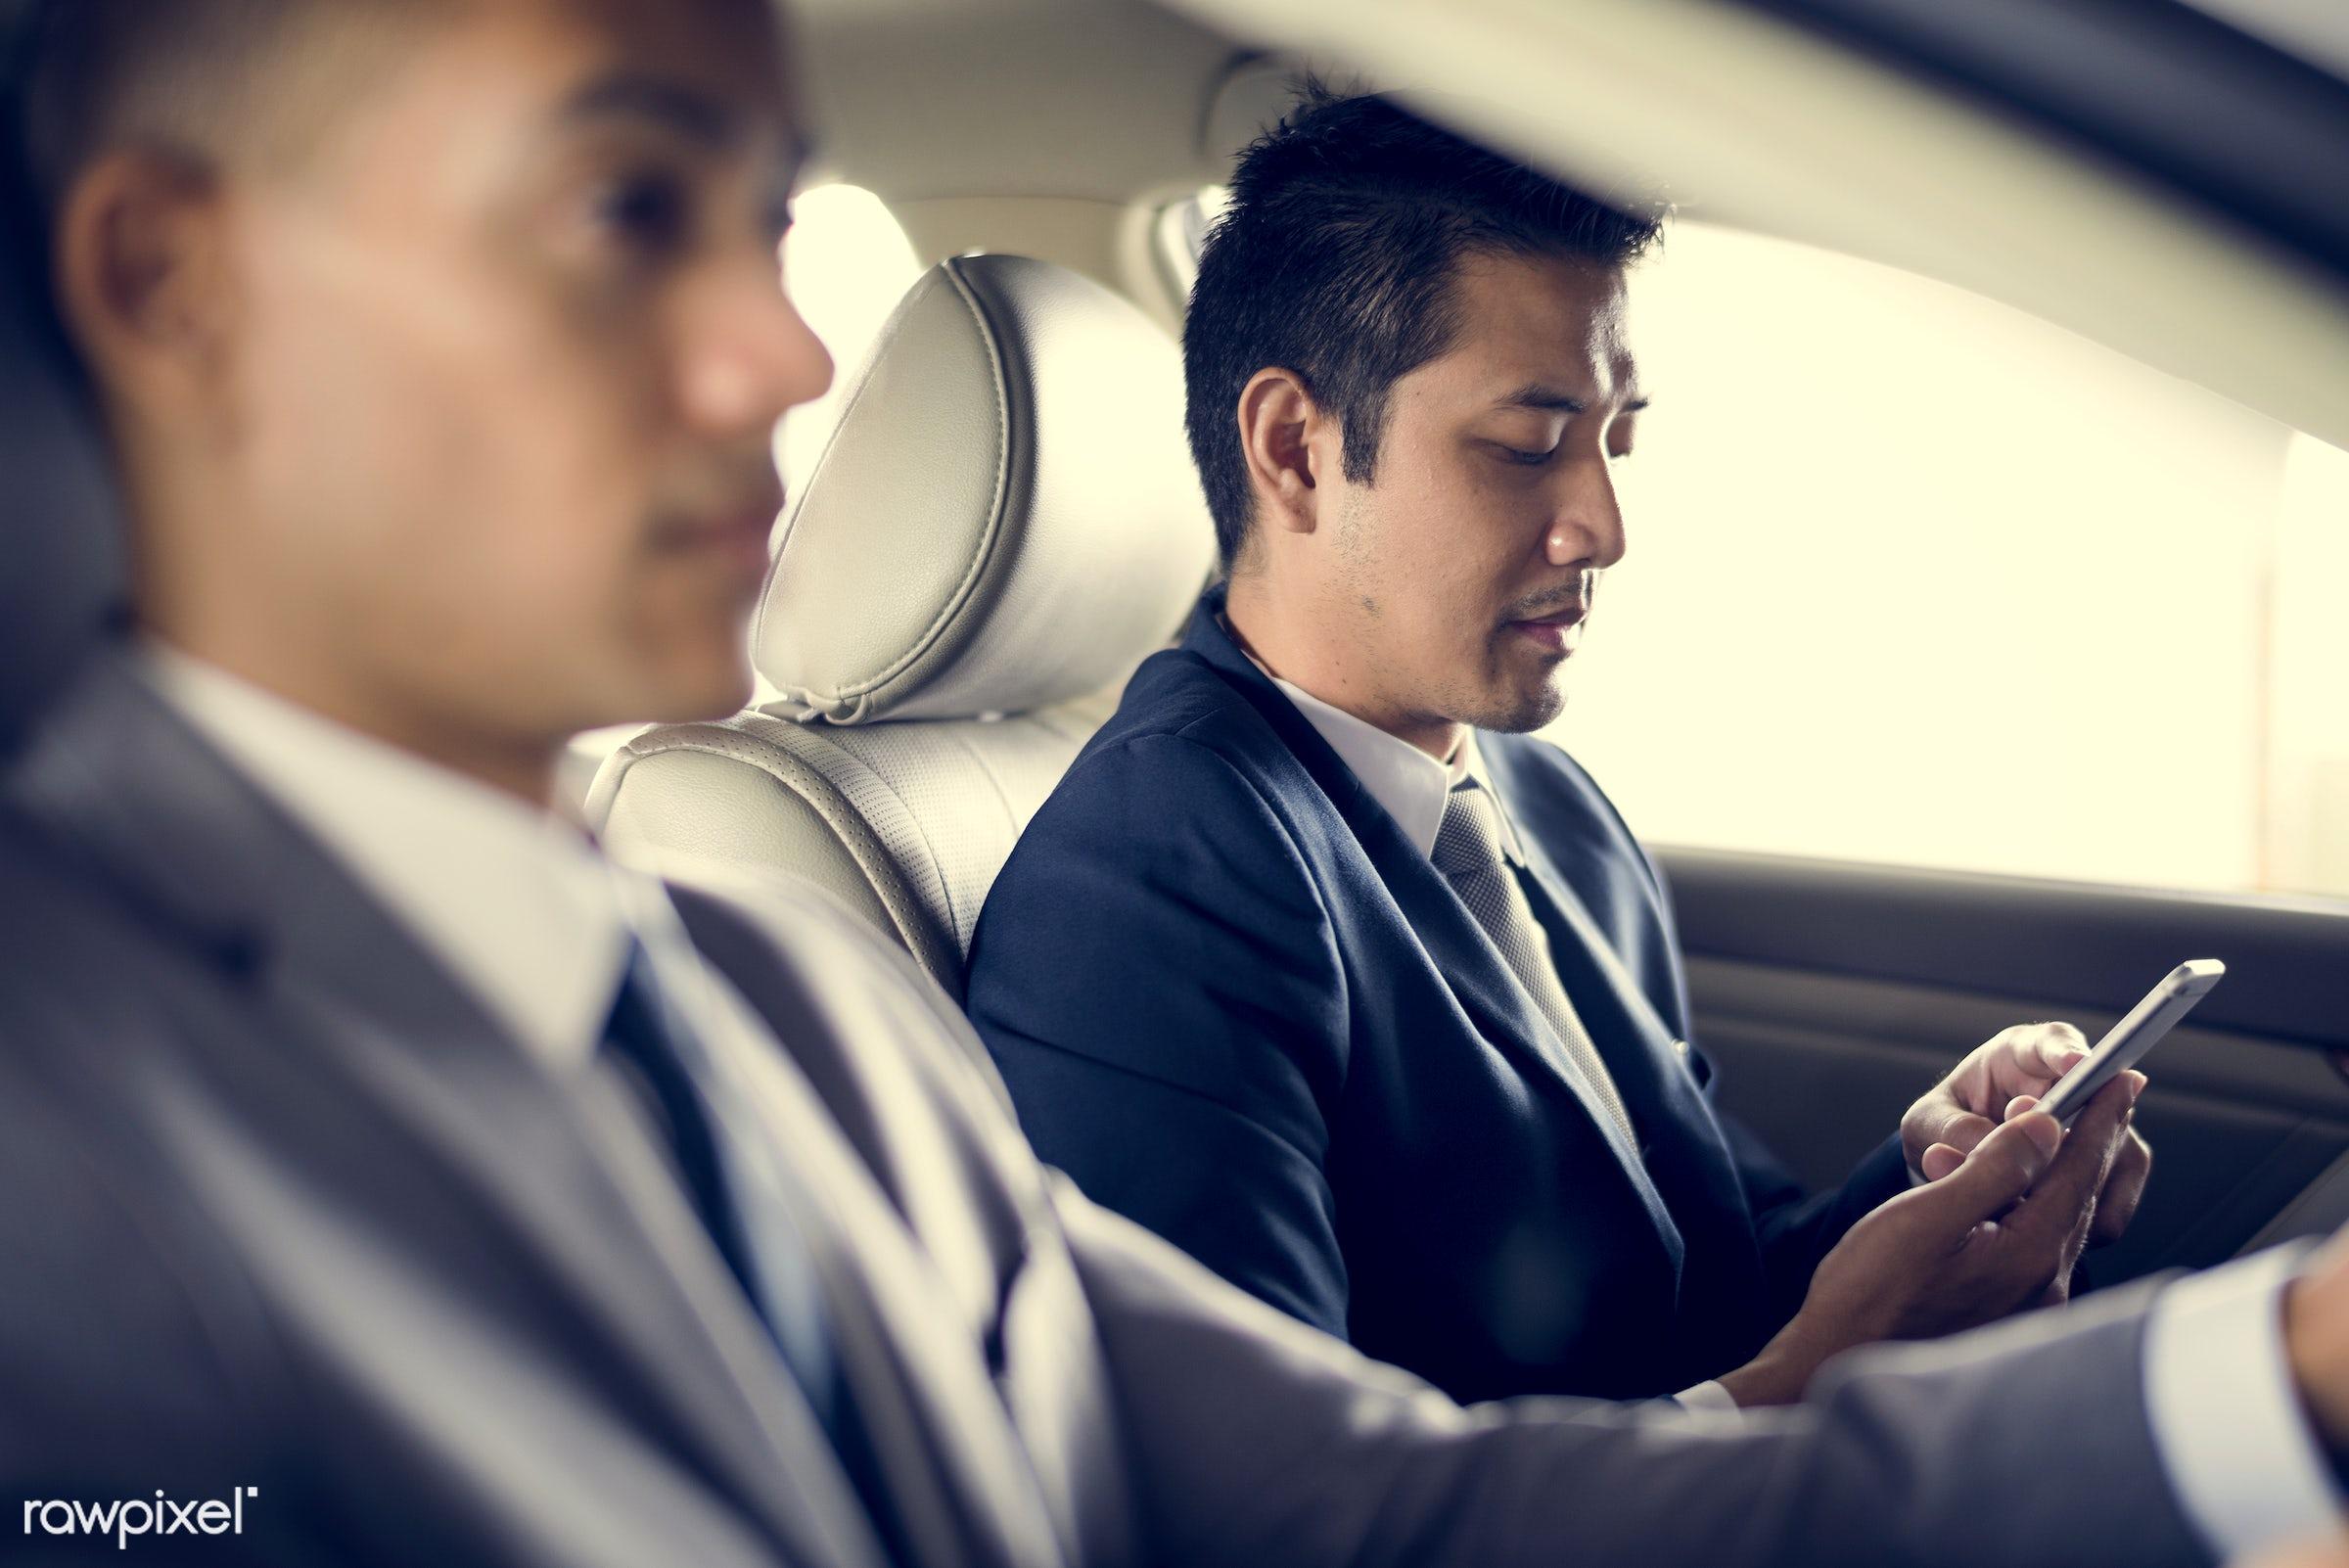 adult, business, businessman, businessmen, candid, car, colleague, communication, corporate, device, digital device,...